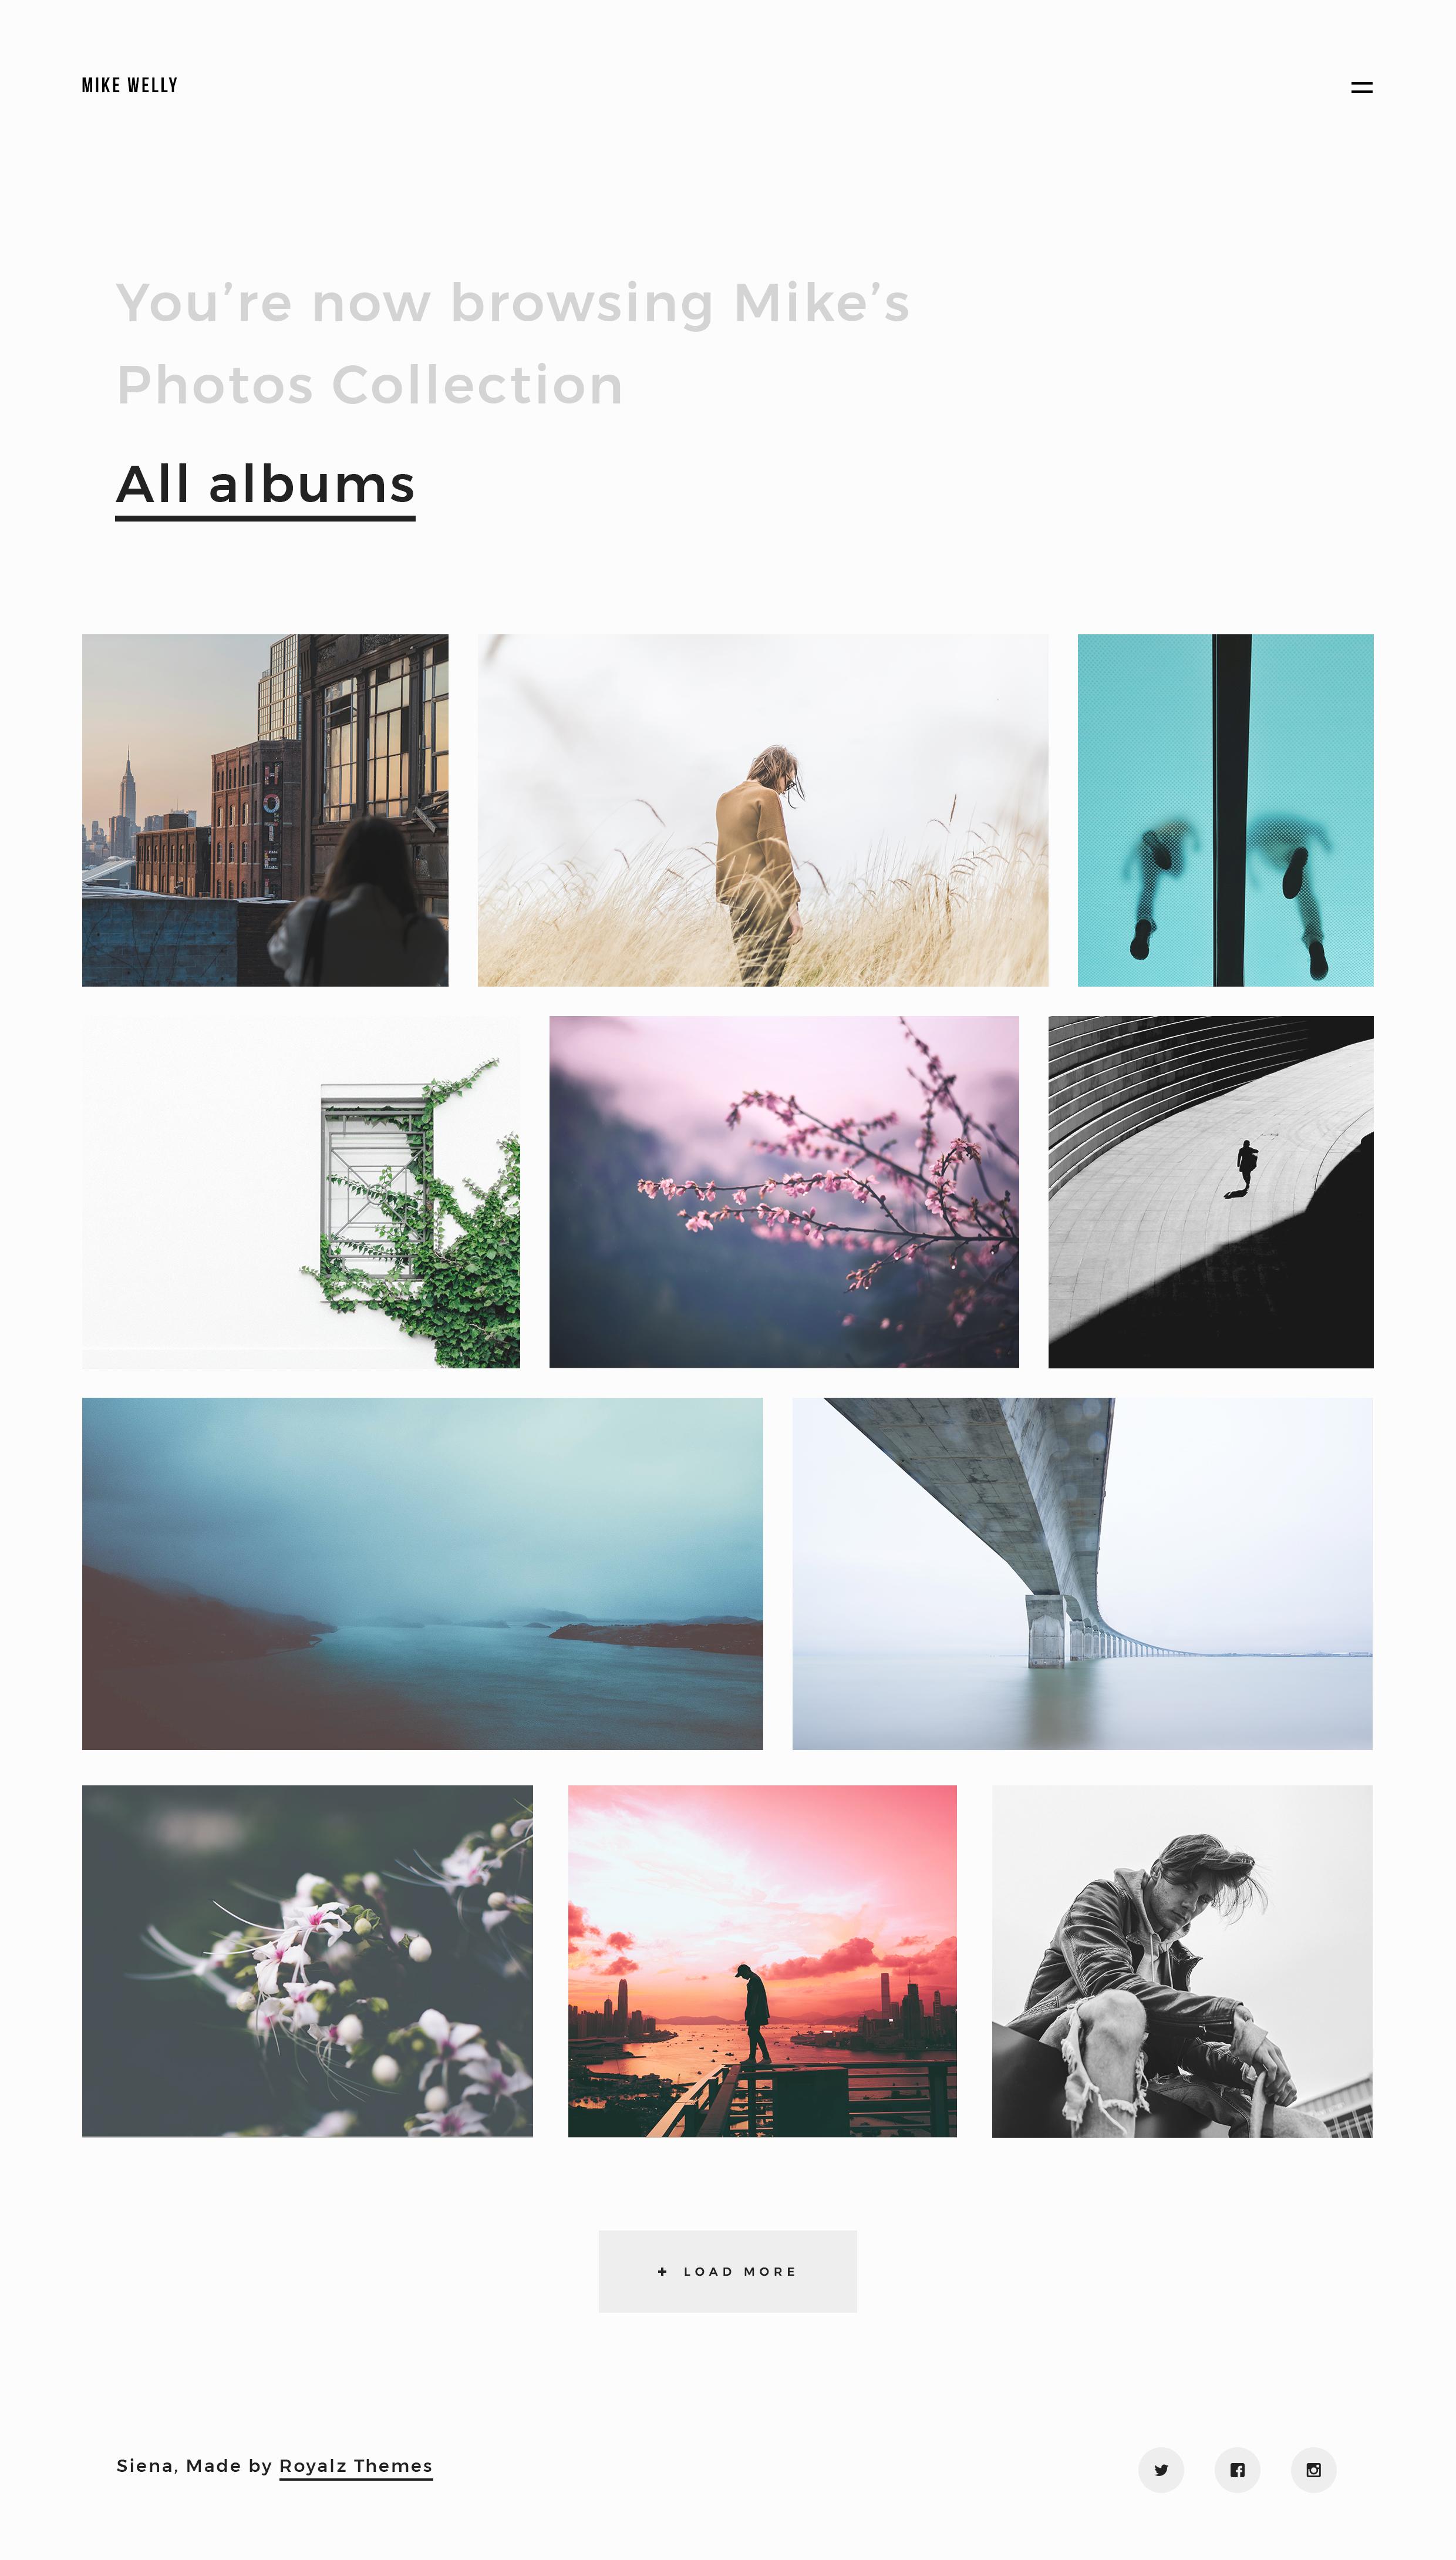 siena aesthetic photography portfolio template by royalzthemes themeforest. Black Bedroom Furniture Sets. Home Design Ideas